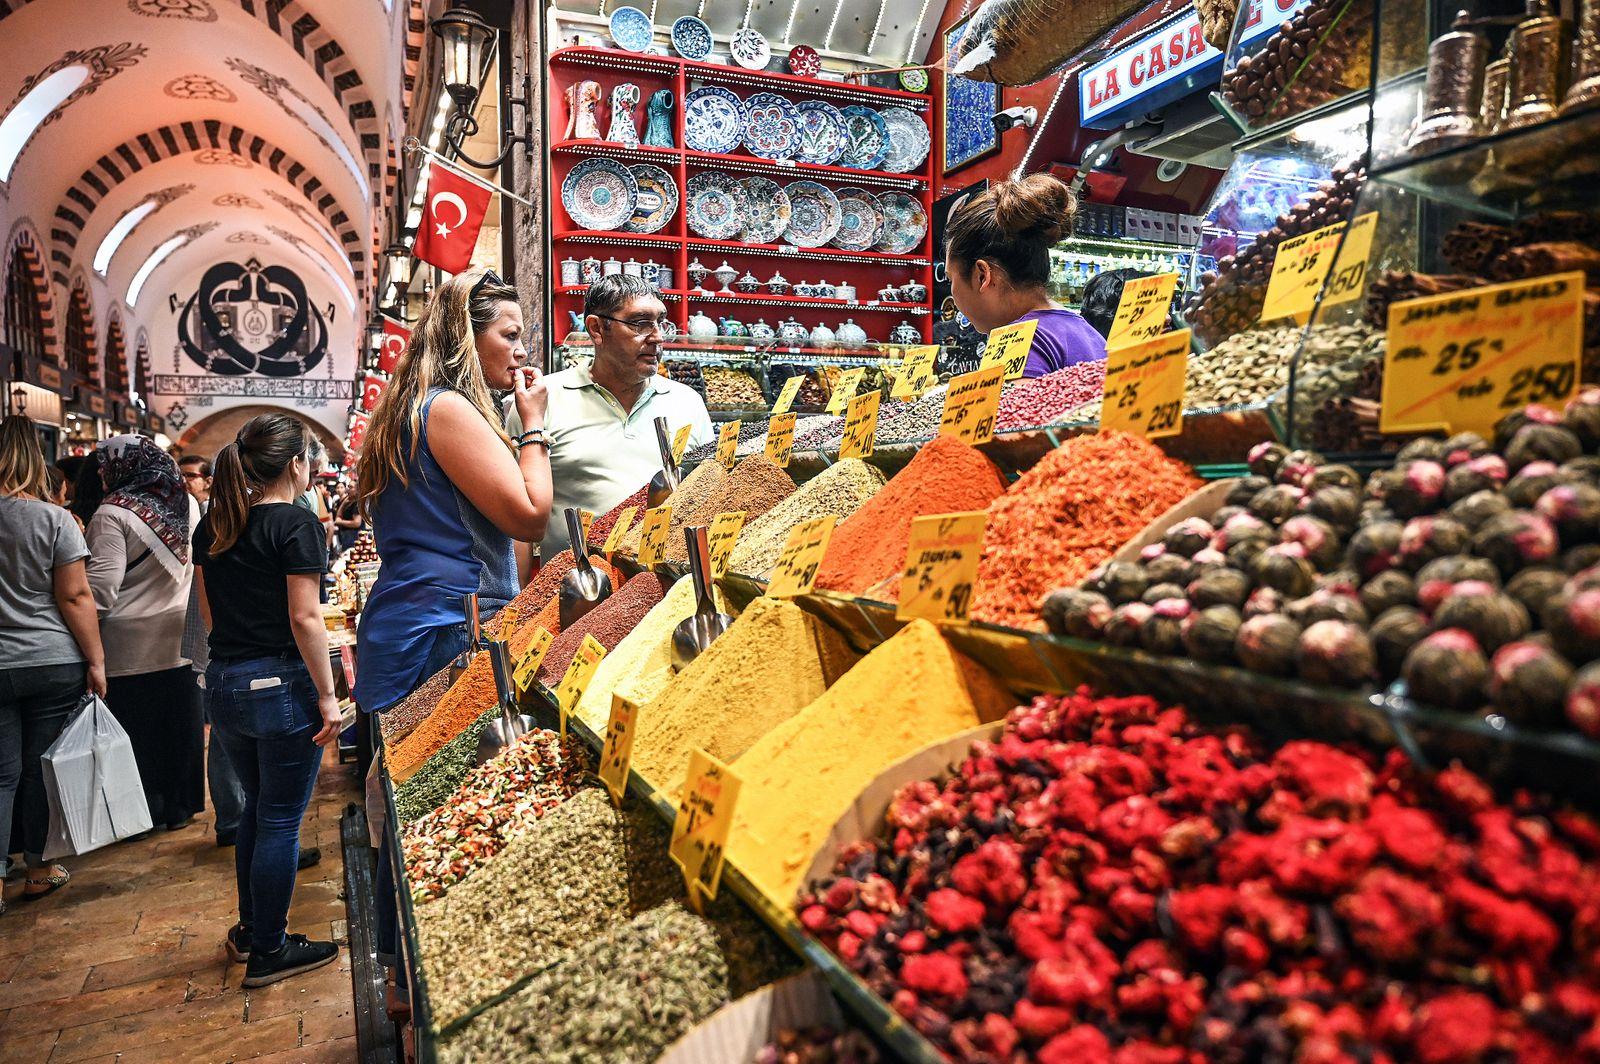 TURKEY-DAILY LIFE-ECONOMY-FEATURE